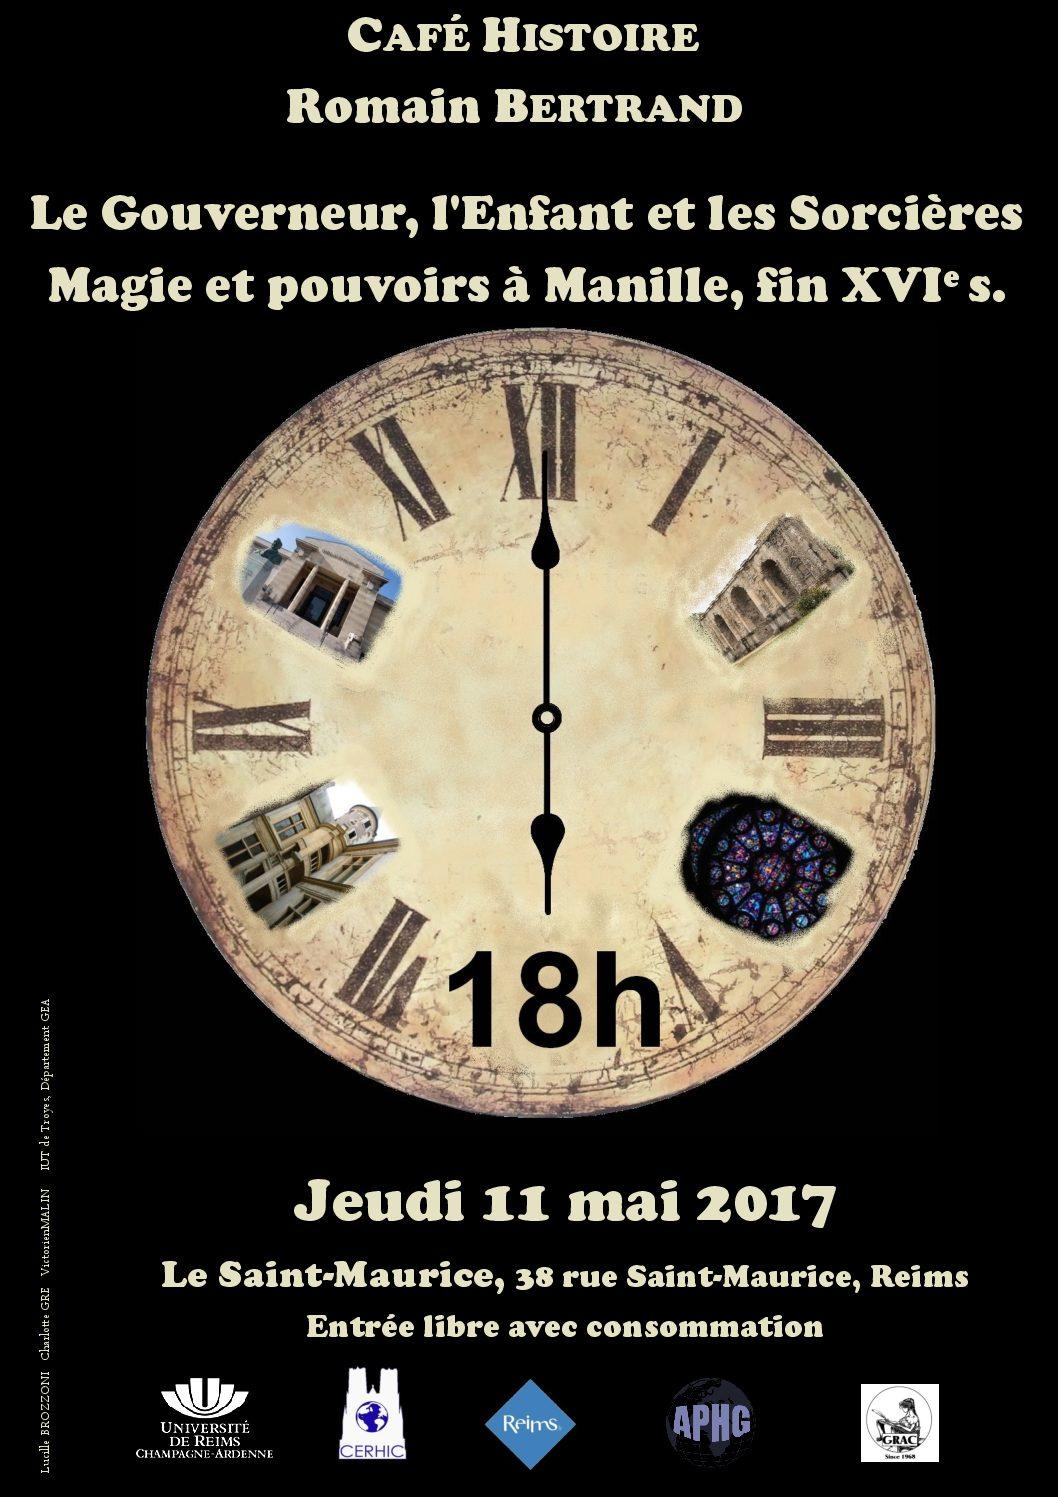 PROCHAIN CAFE HISTOIRE, JEUDI 11 MAI – ROMAIN BERTRAND